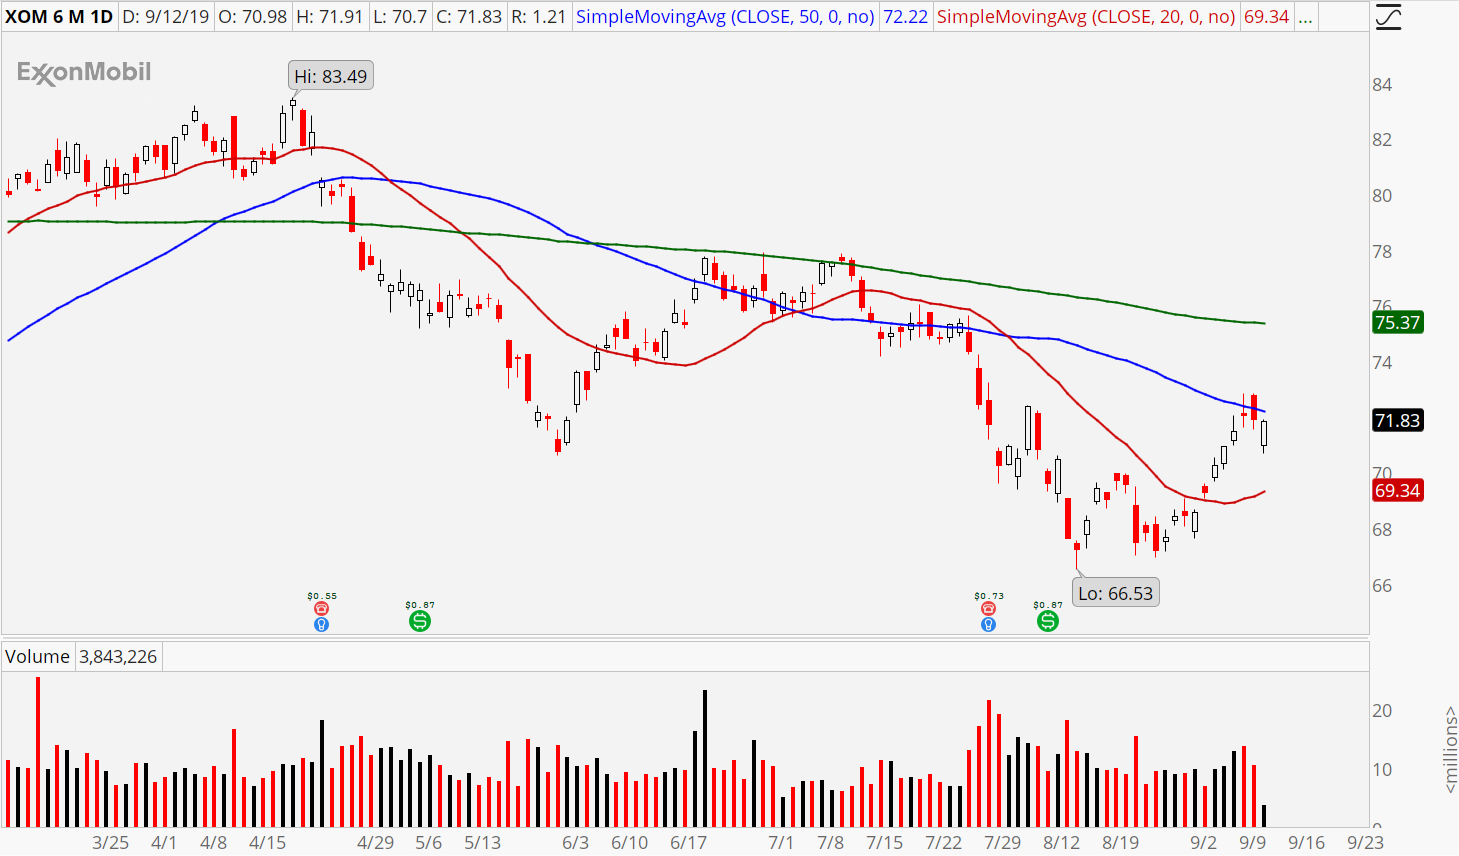 3 Sector Rotation Stocks to Buy: Exxon Mobil (XOM)